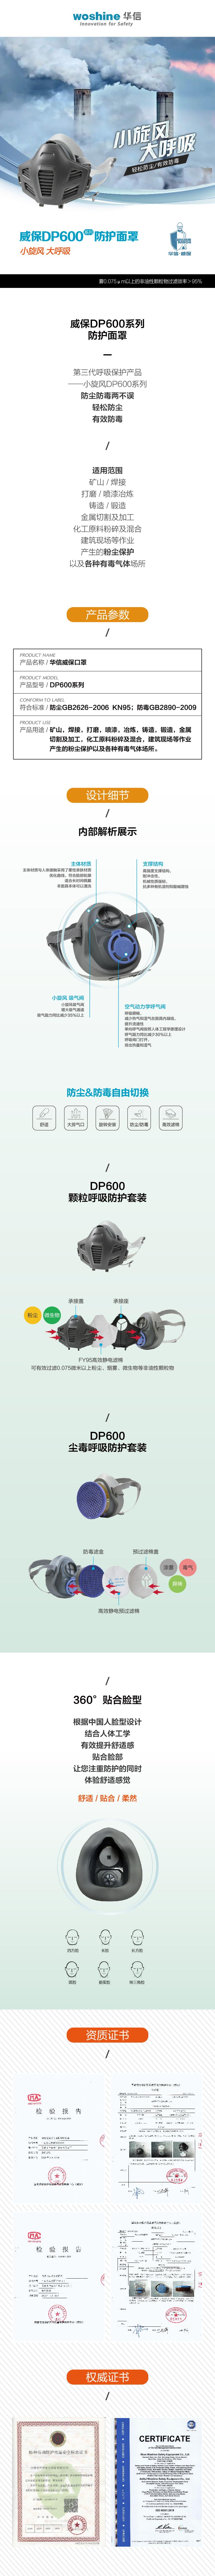 DP600呼吸半面罩